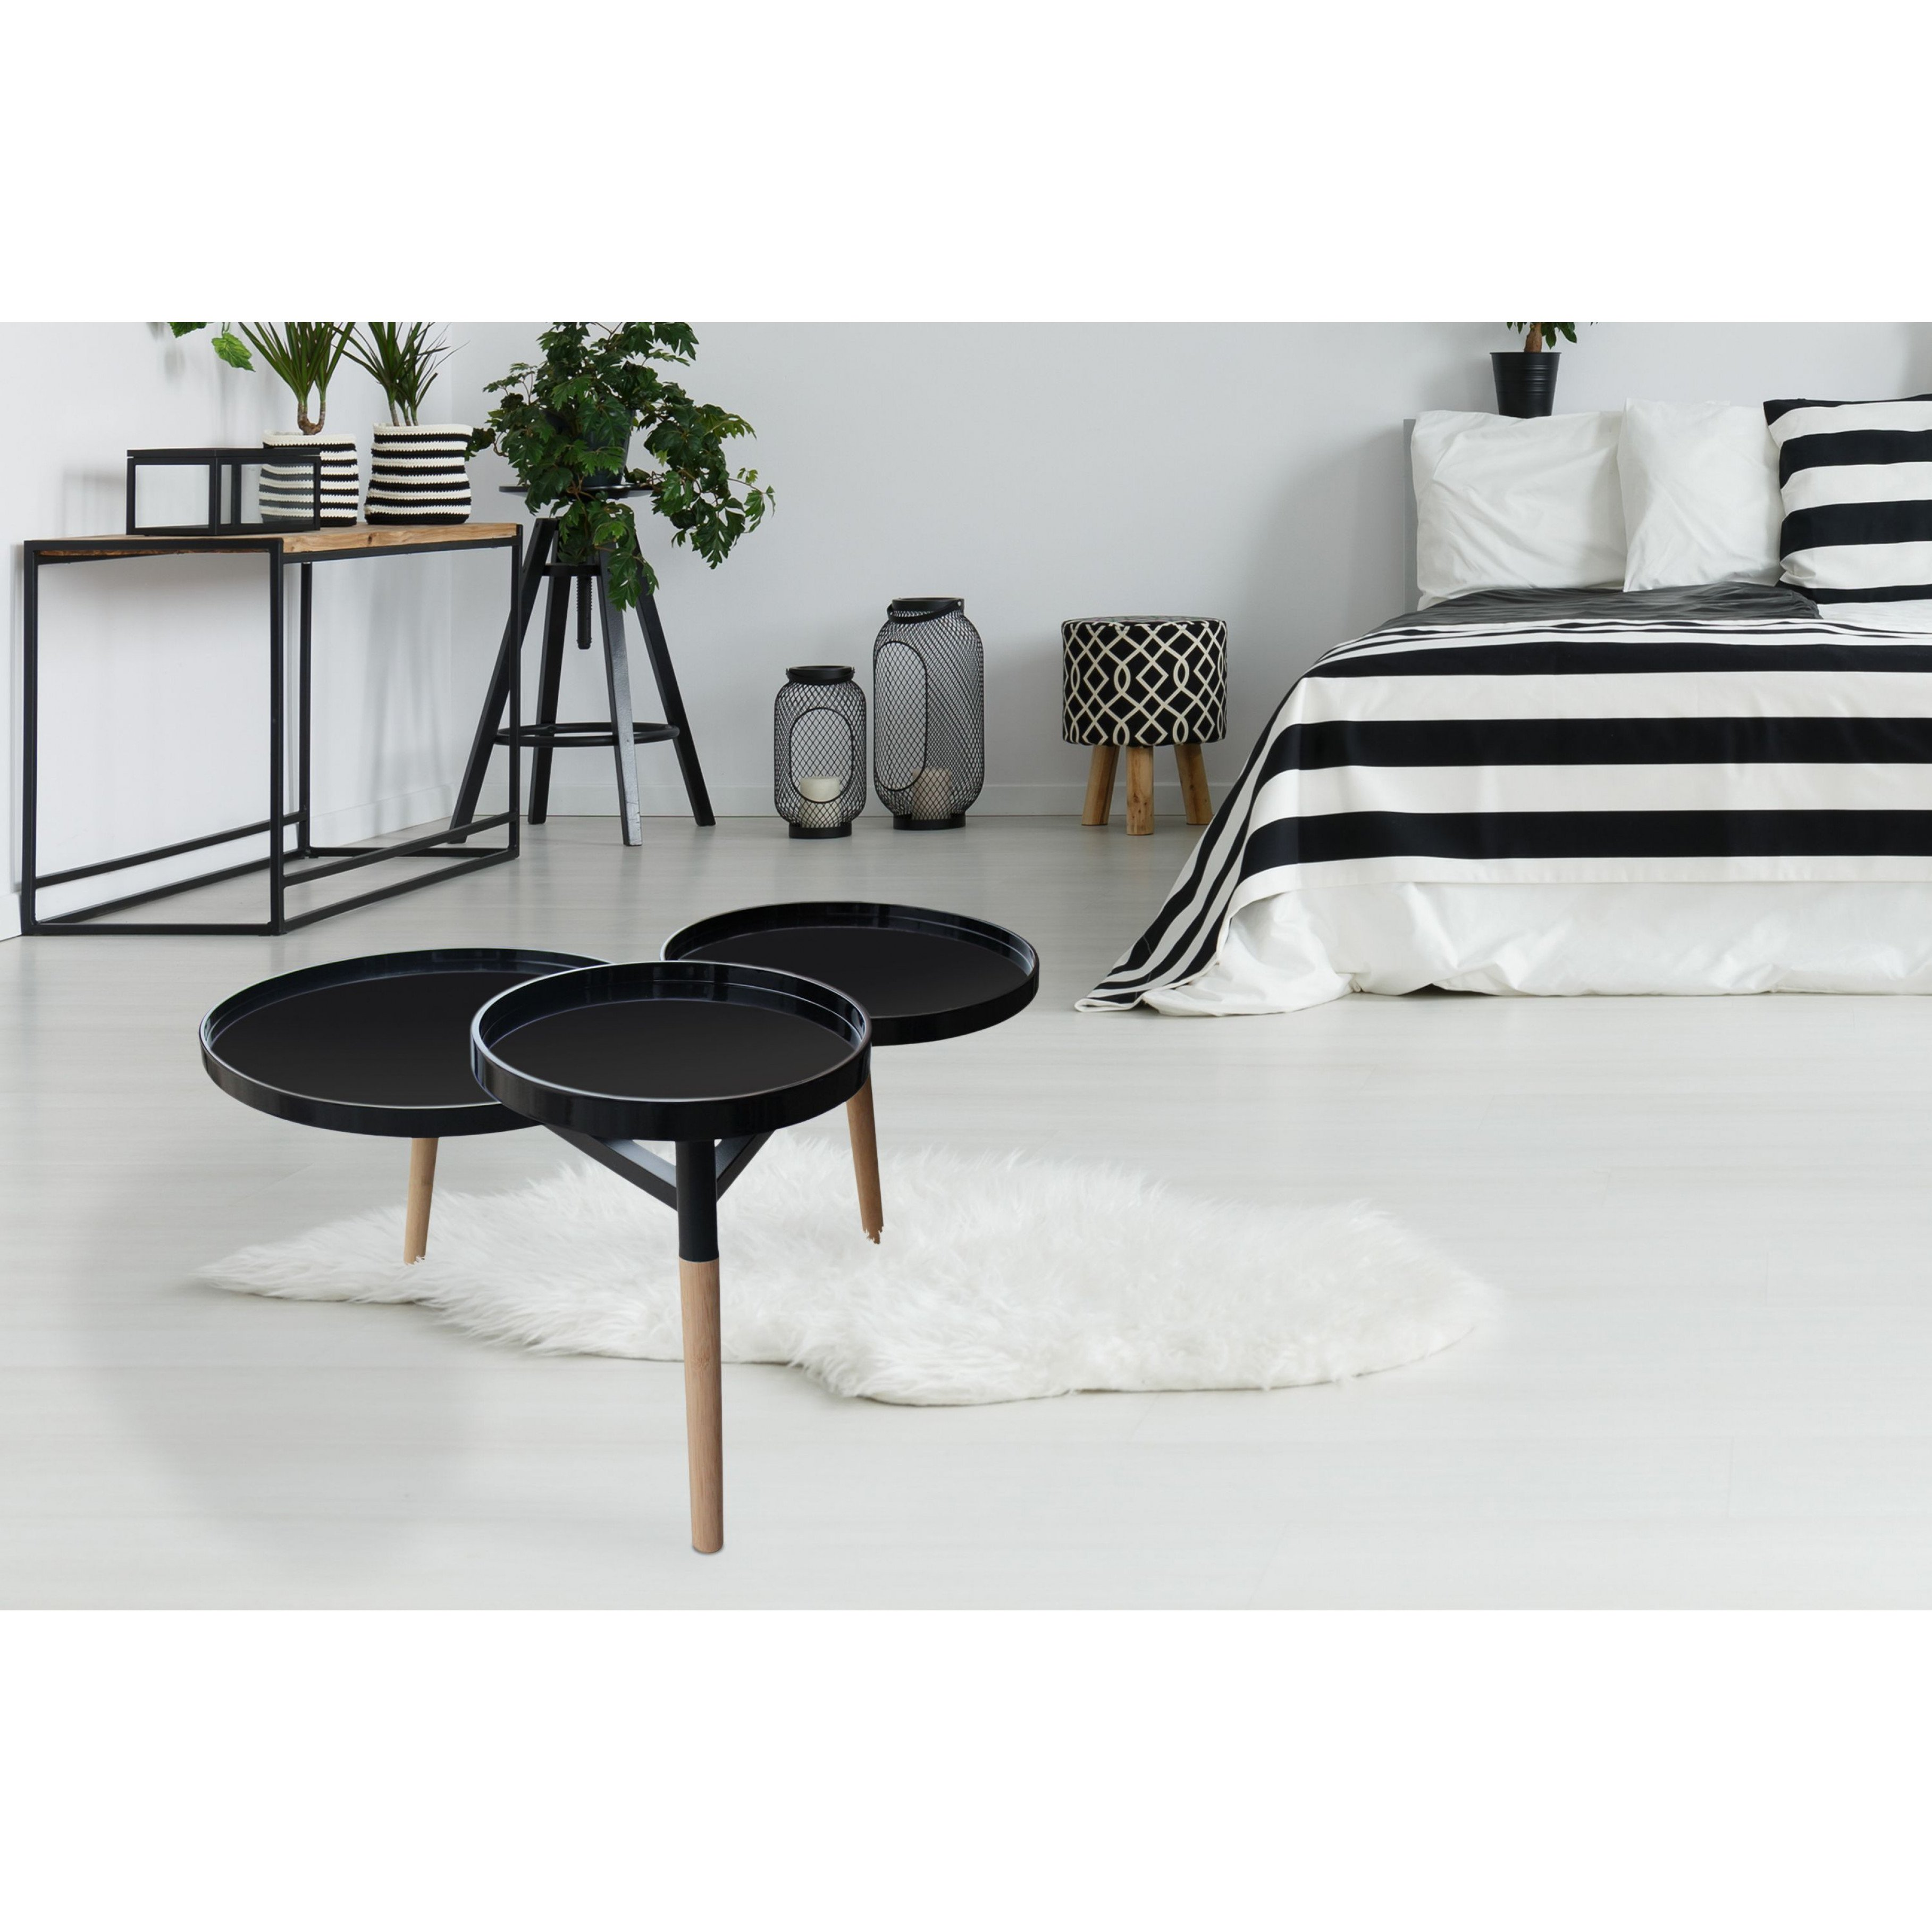 Side Table Milton 2 | Black